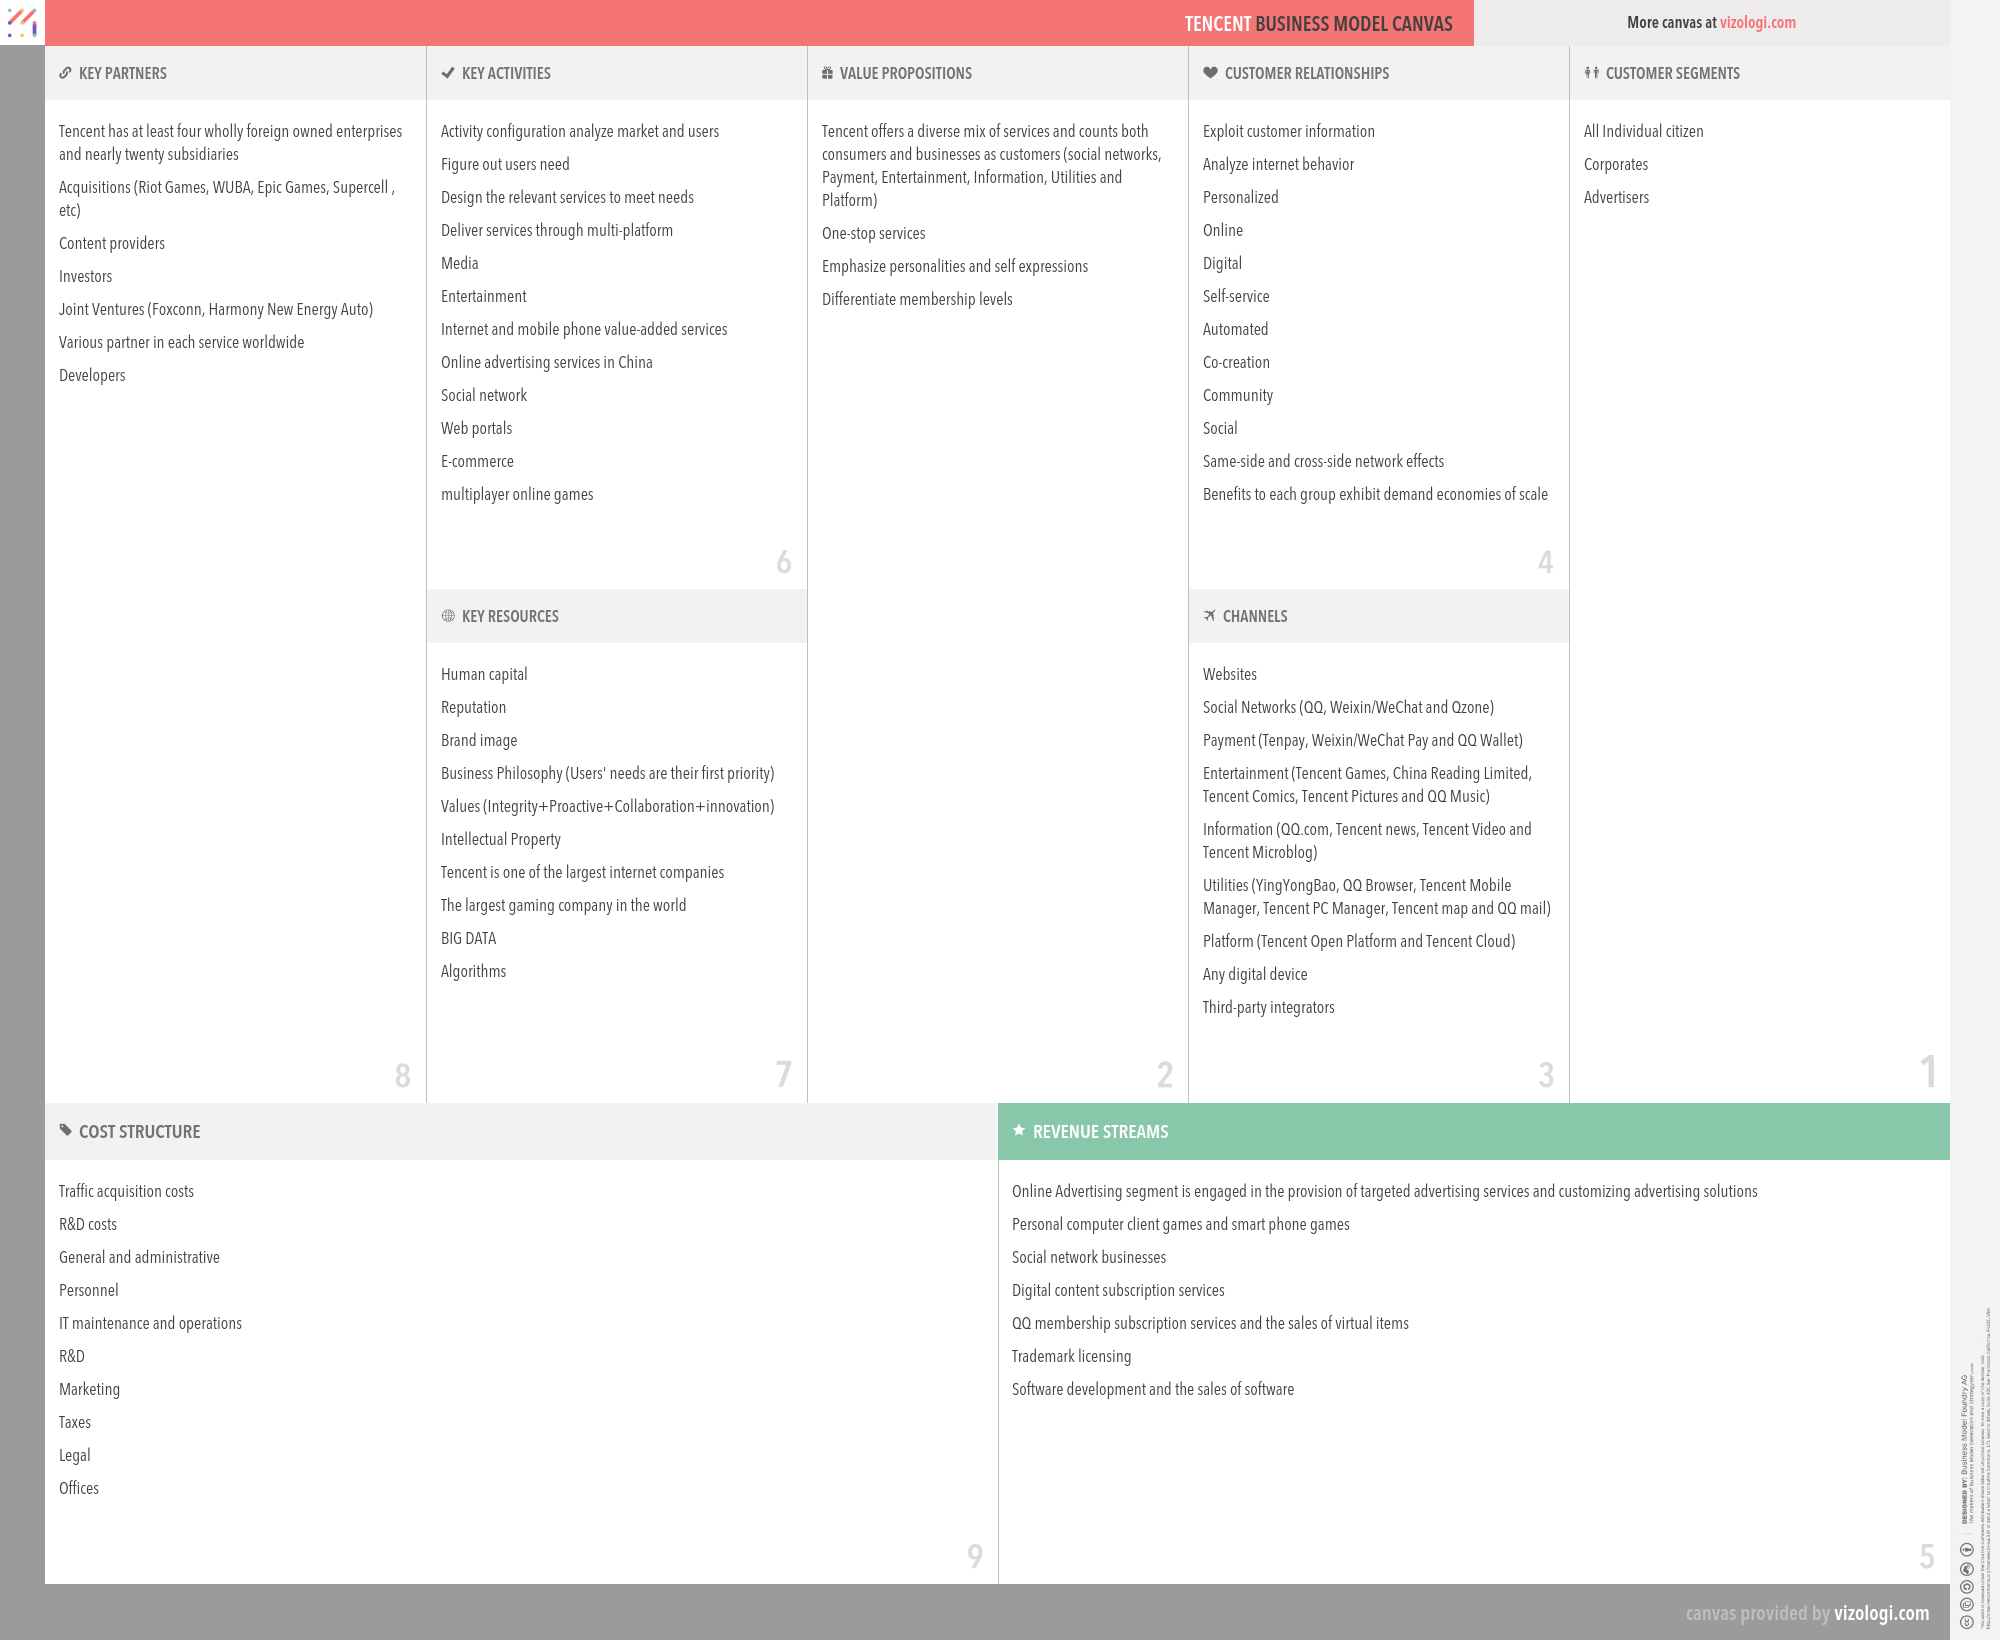 Tencent business model canvas | Illuminerd | Business model canvas